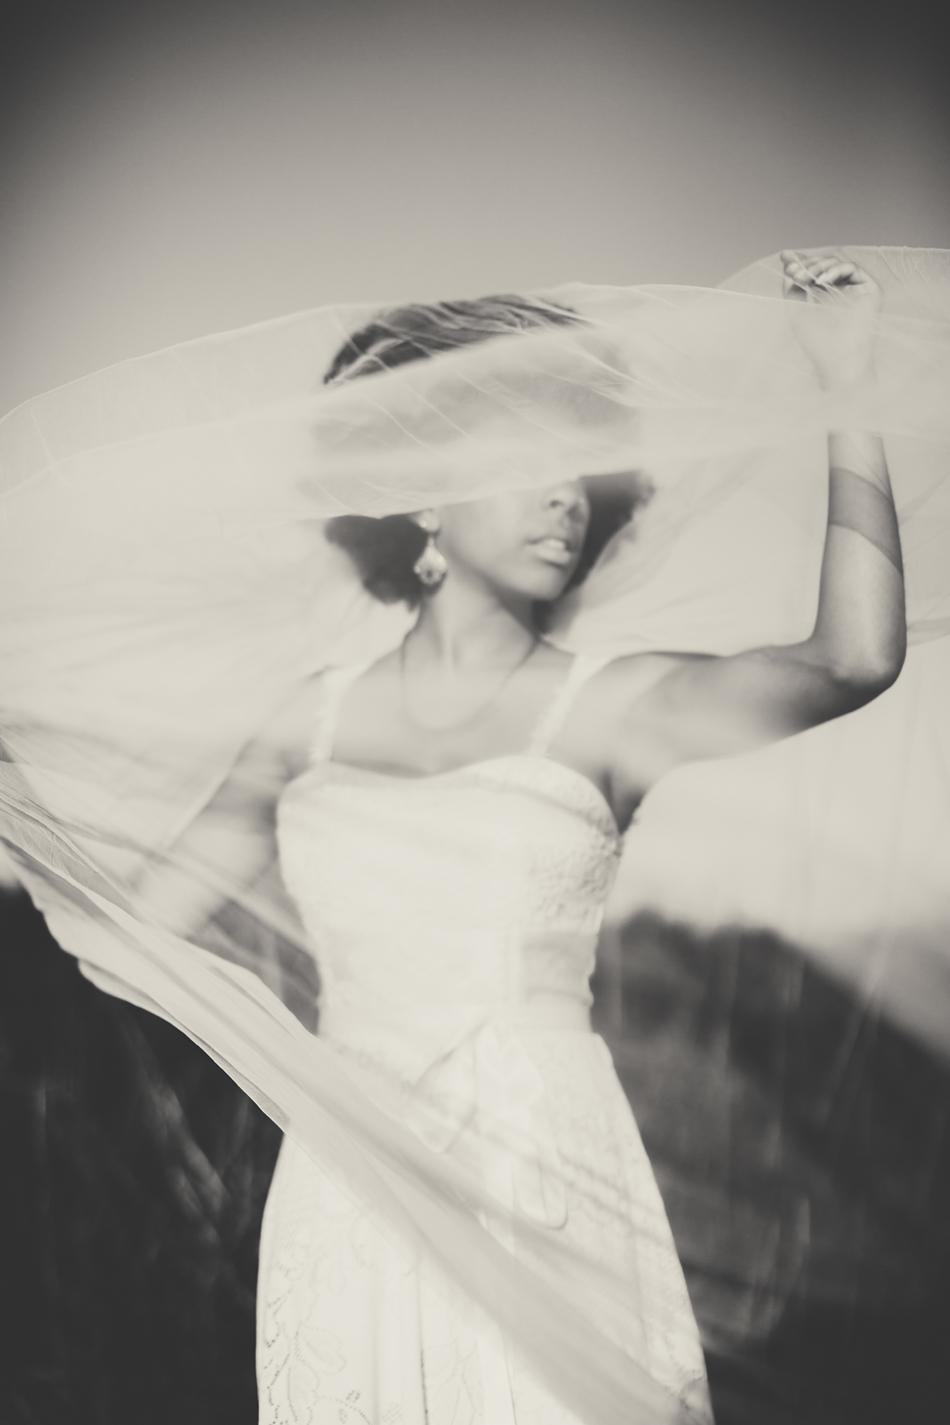 Jameykay_arlie_bohemian_elopement_styled_shoot025.jpg